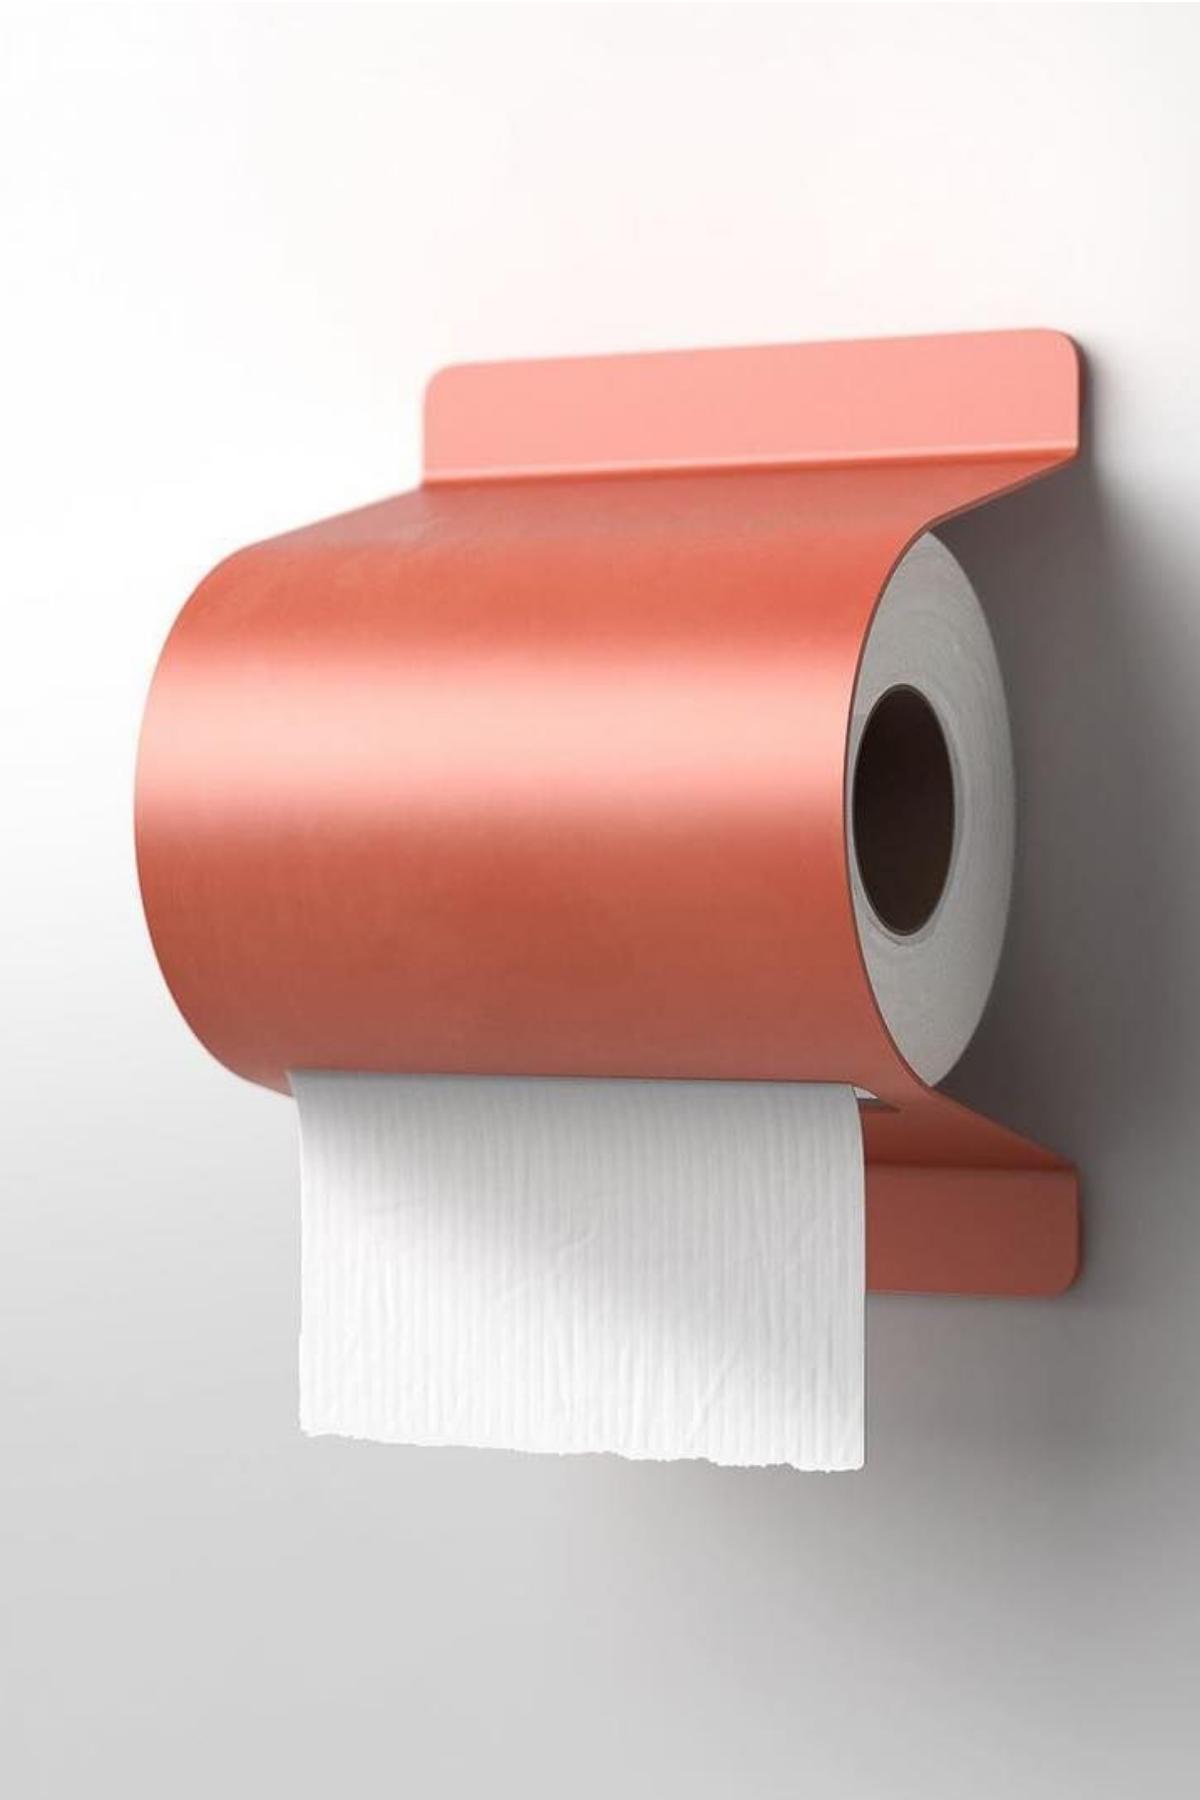 Toilet Paper Holder By Rinnai Style Japan Diy Toilet Paper Holder Diy Toilet Toilet Paper Holder